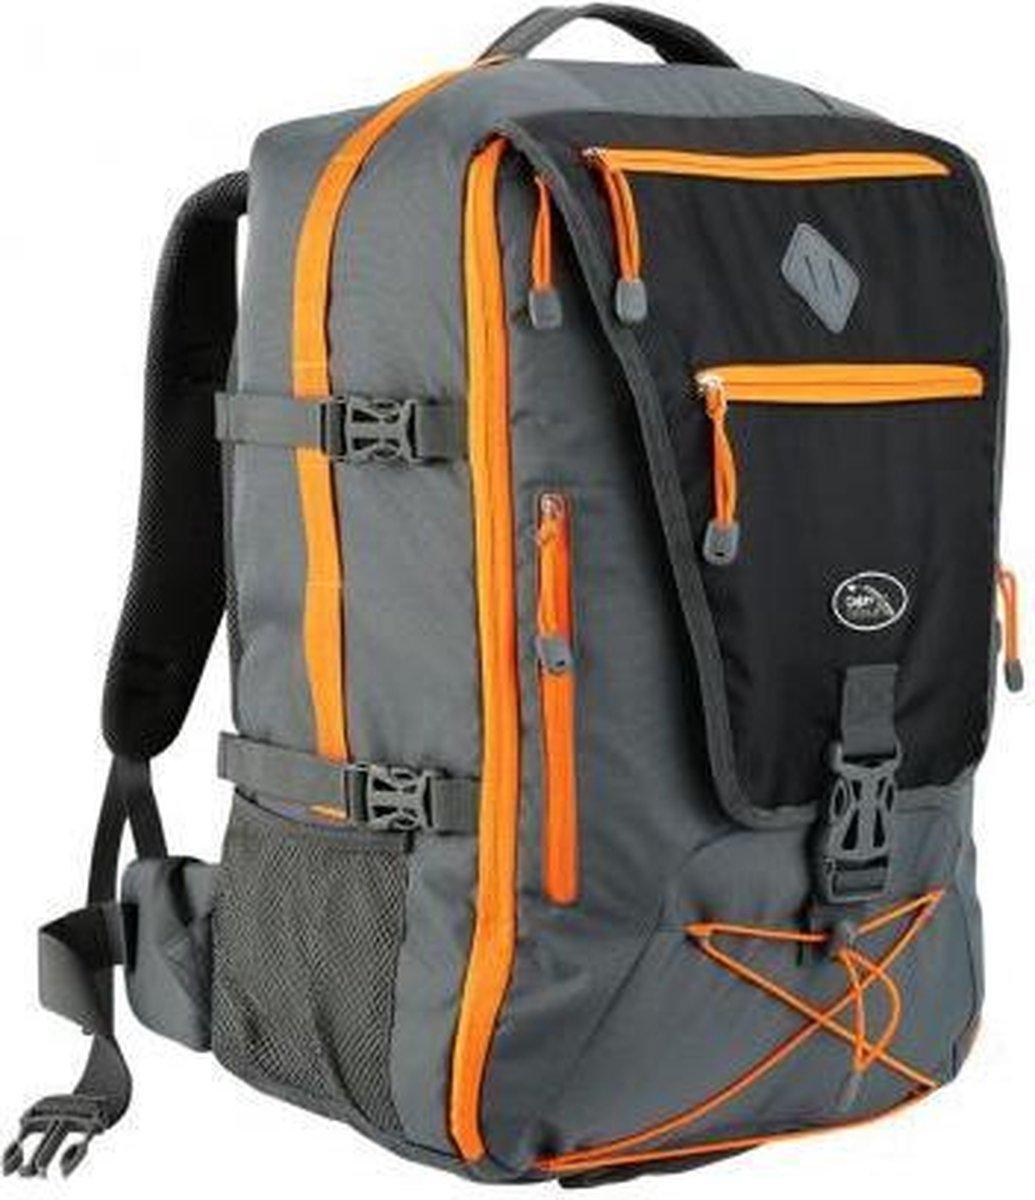 CabinMax Rugzak - Wandelrugzak - Handbagage - 46L Reistas - Rugtas - 54x36x23cm - Grijs (EQ GY/OE)